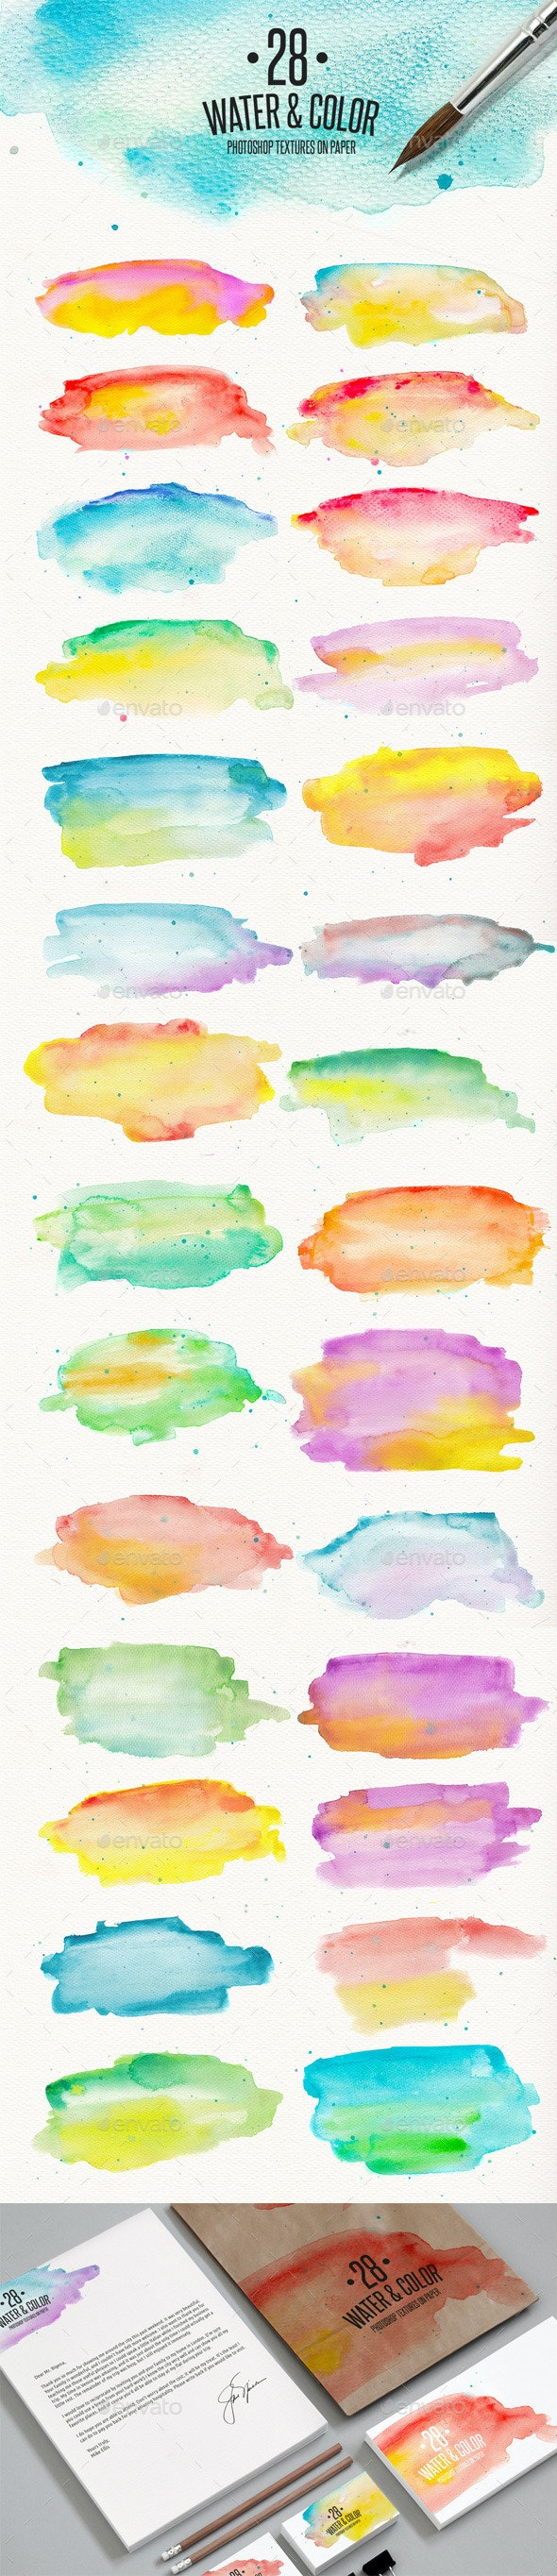 28 Watercolor Textures on Paper - Paper Textures